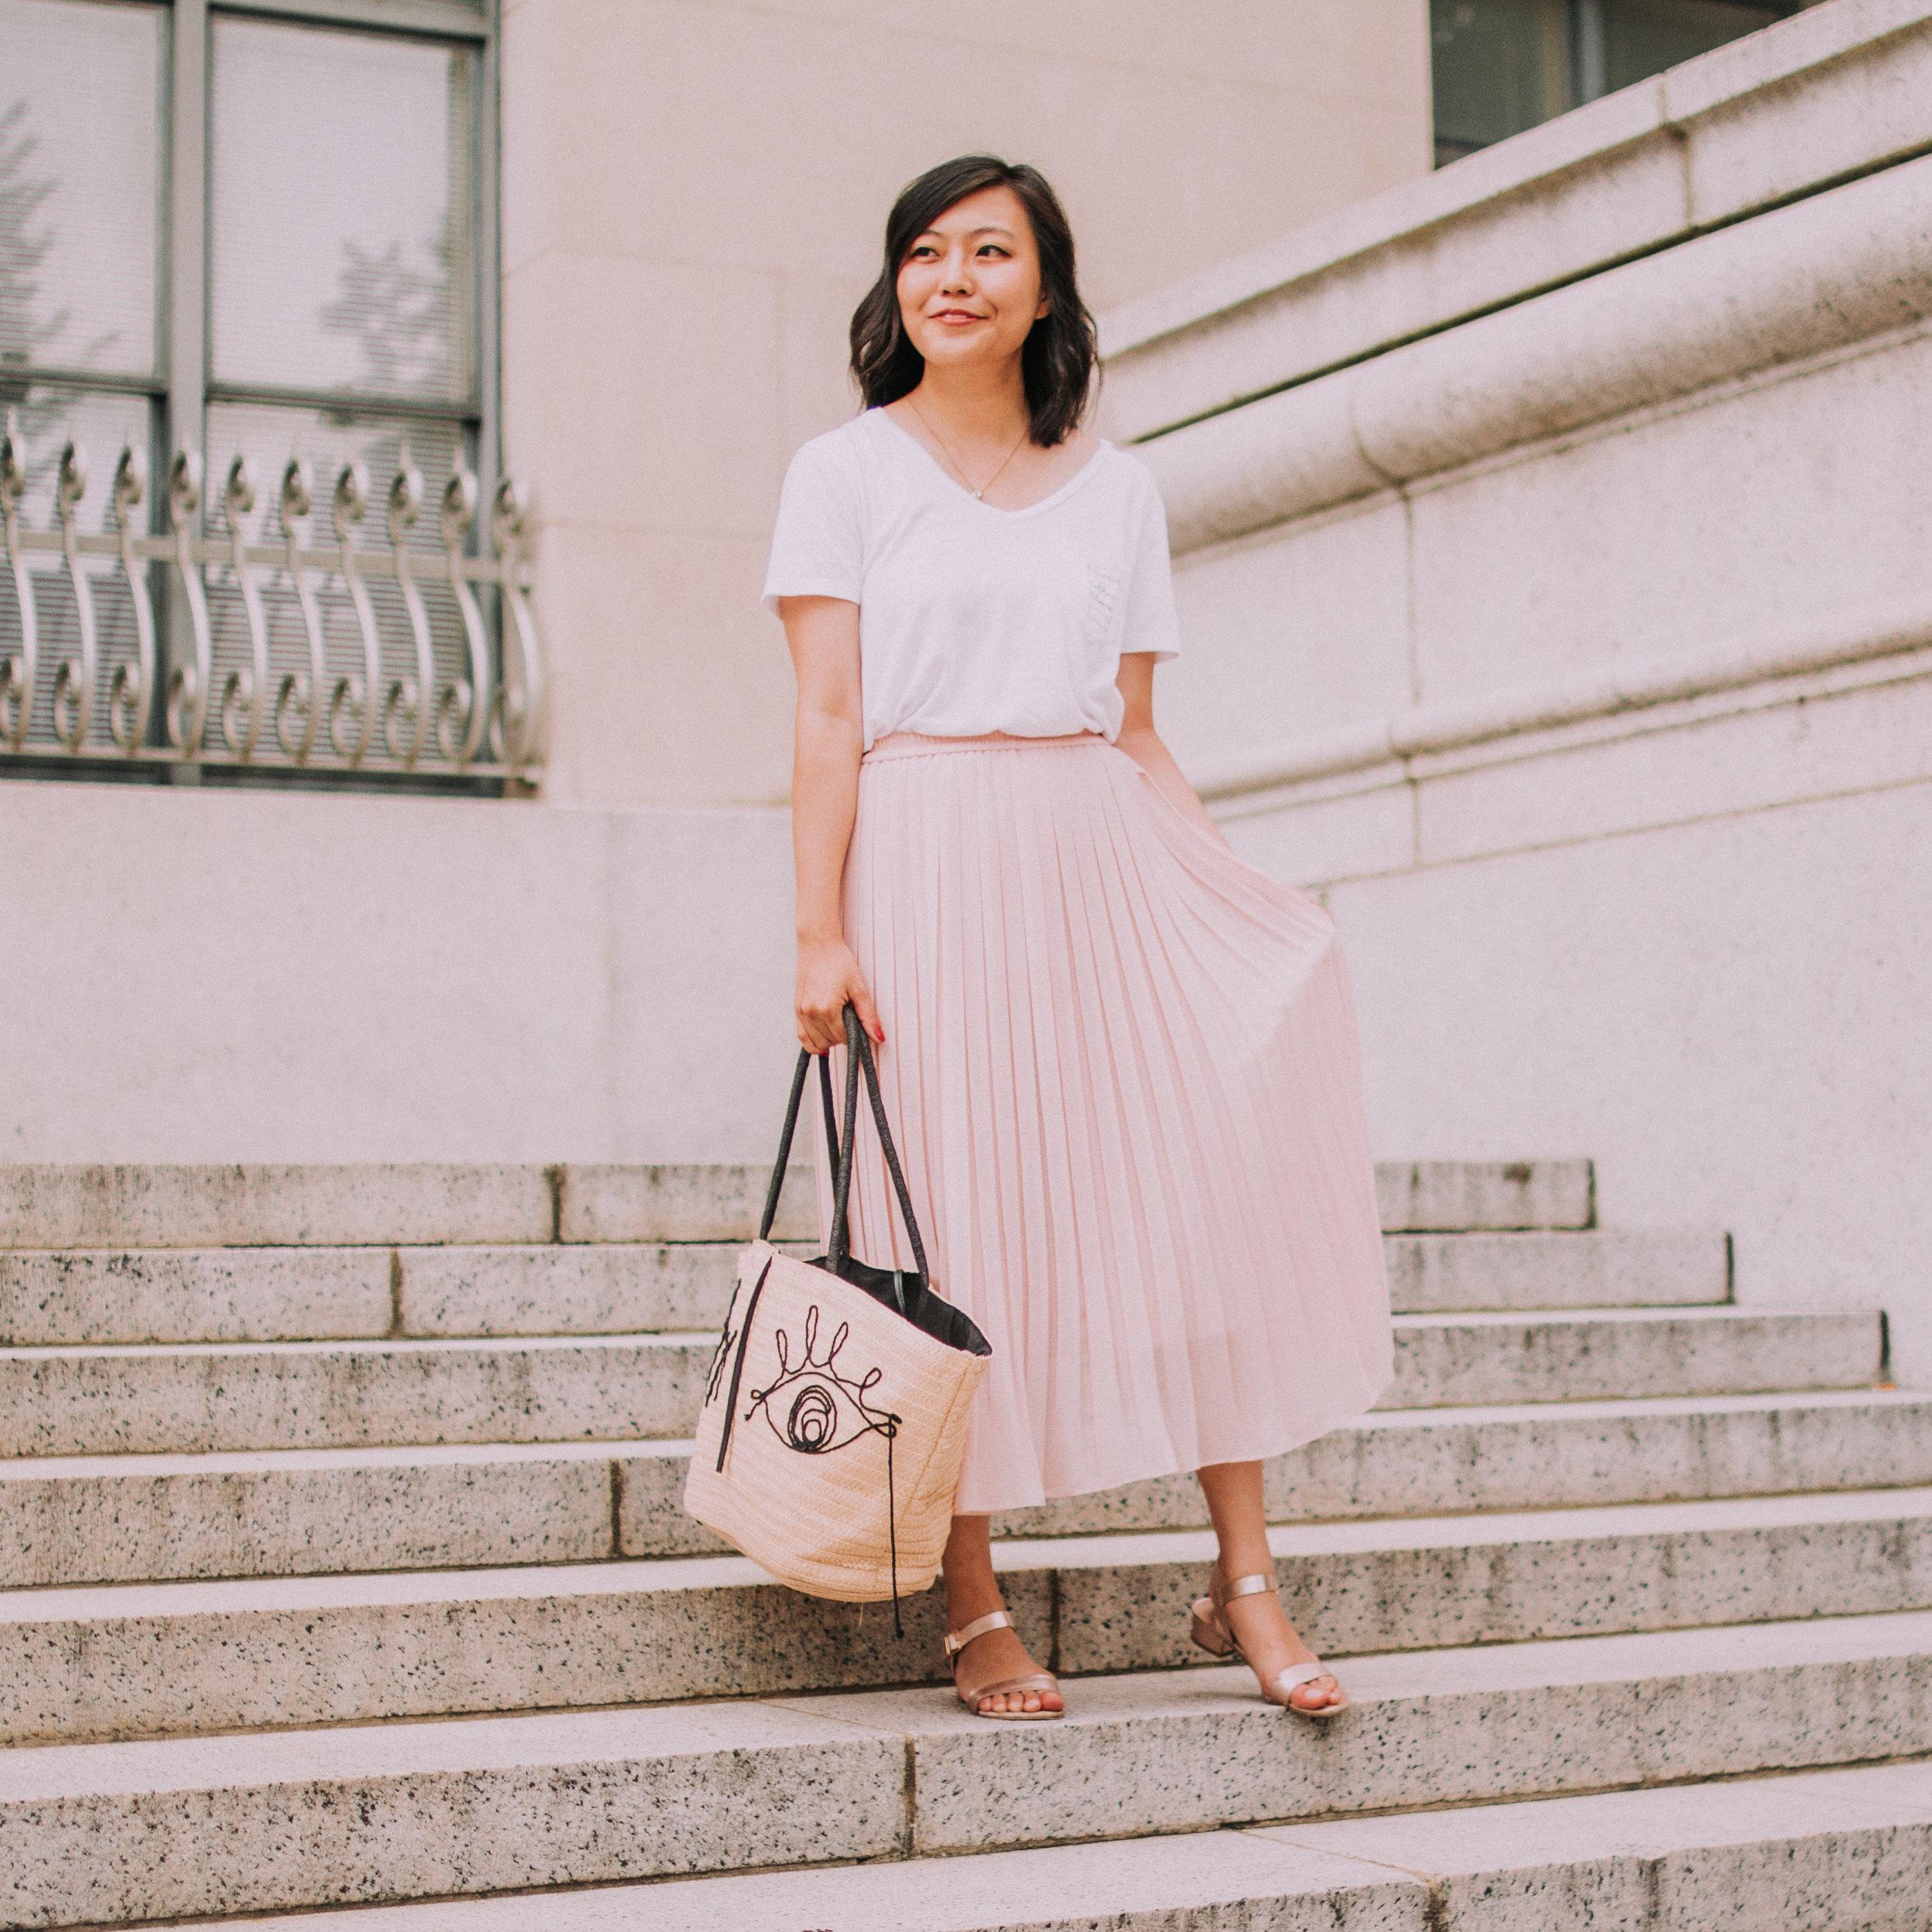 Pleated Midi Skirt and White Tee